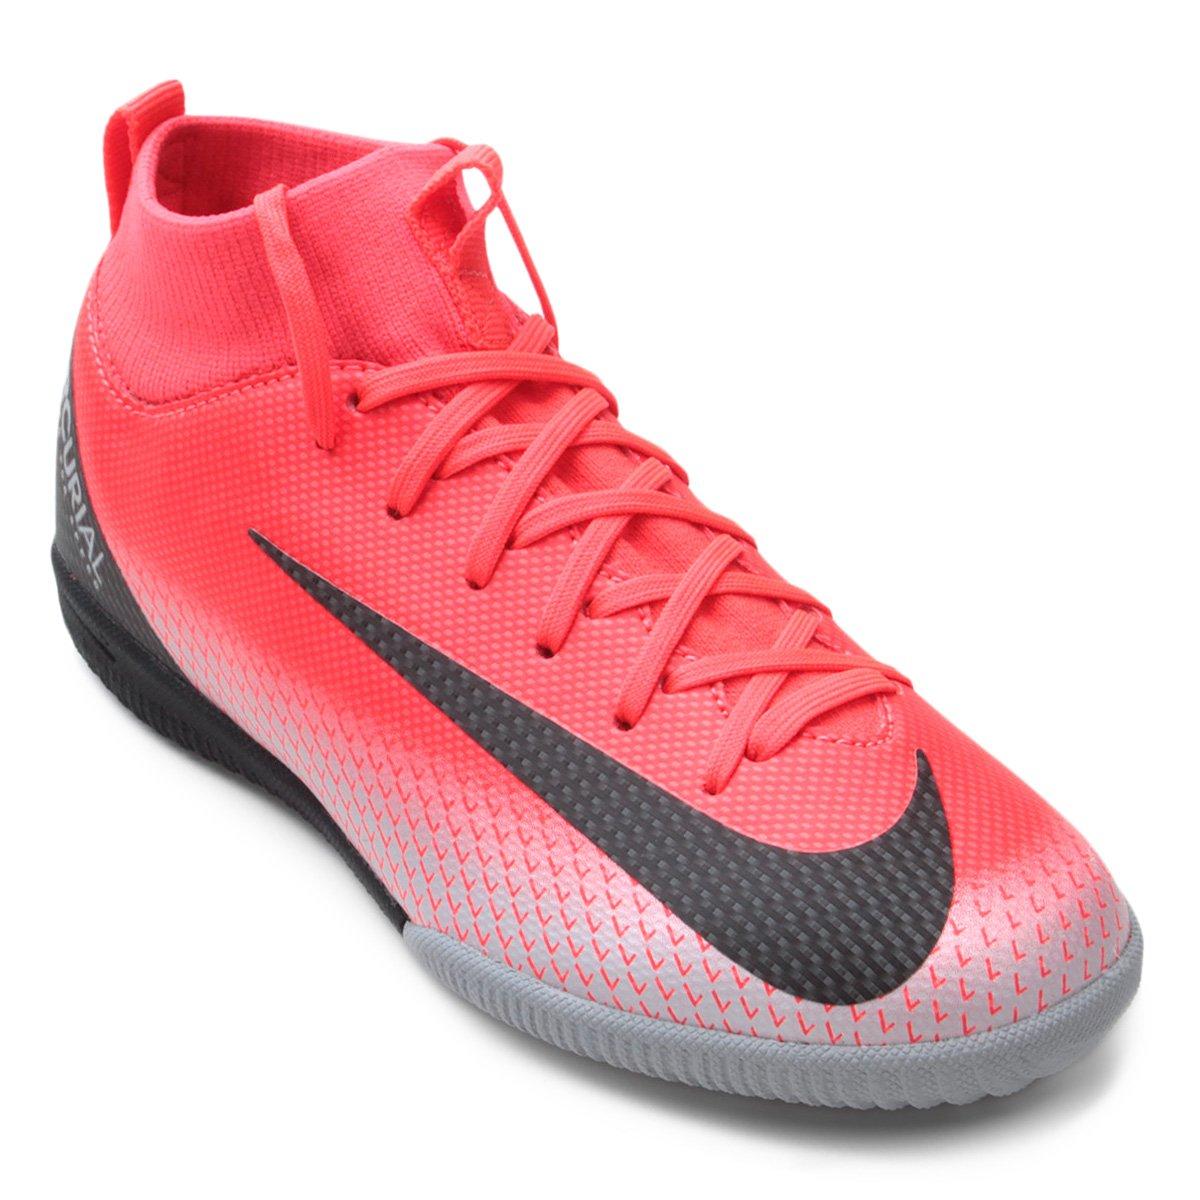 d615c6f46caba Chuteira Futsal Infantil Nike Mercurial Superfly 6 Academy GS CR7 IC -  Preto e Cinza | Shop Timão